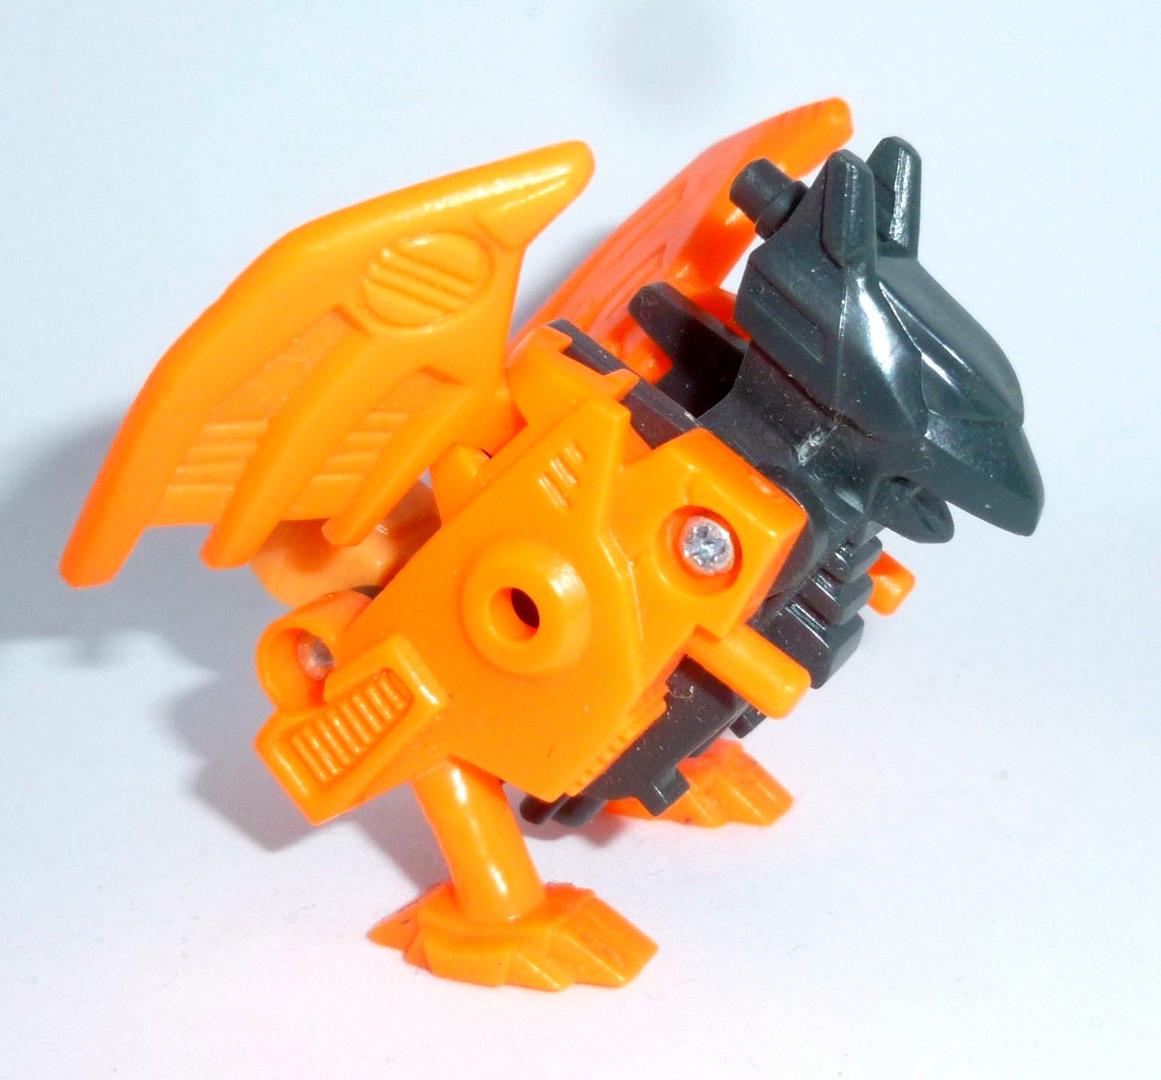 Transformers - Wingthing - G1 Figur Action Masters 1989 Soundwave Actionfigur - Jetzt online Kaufen - 2